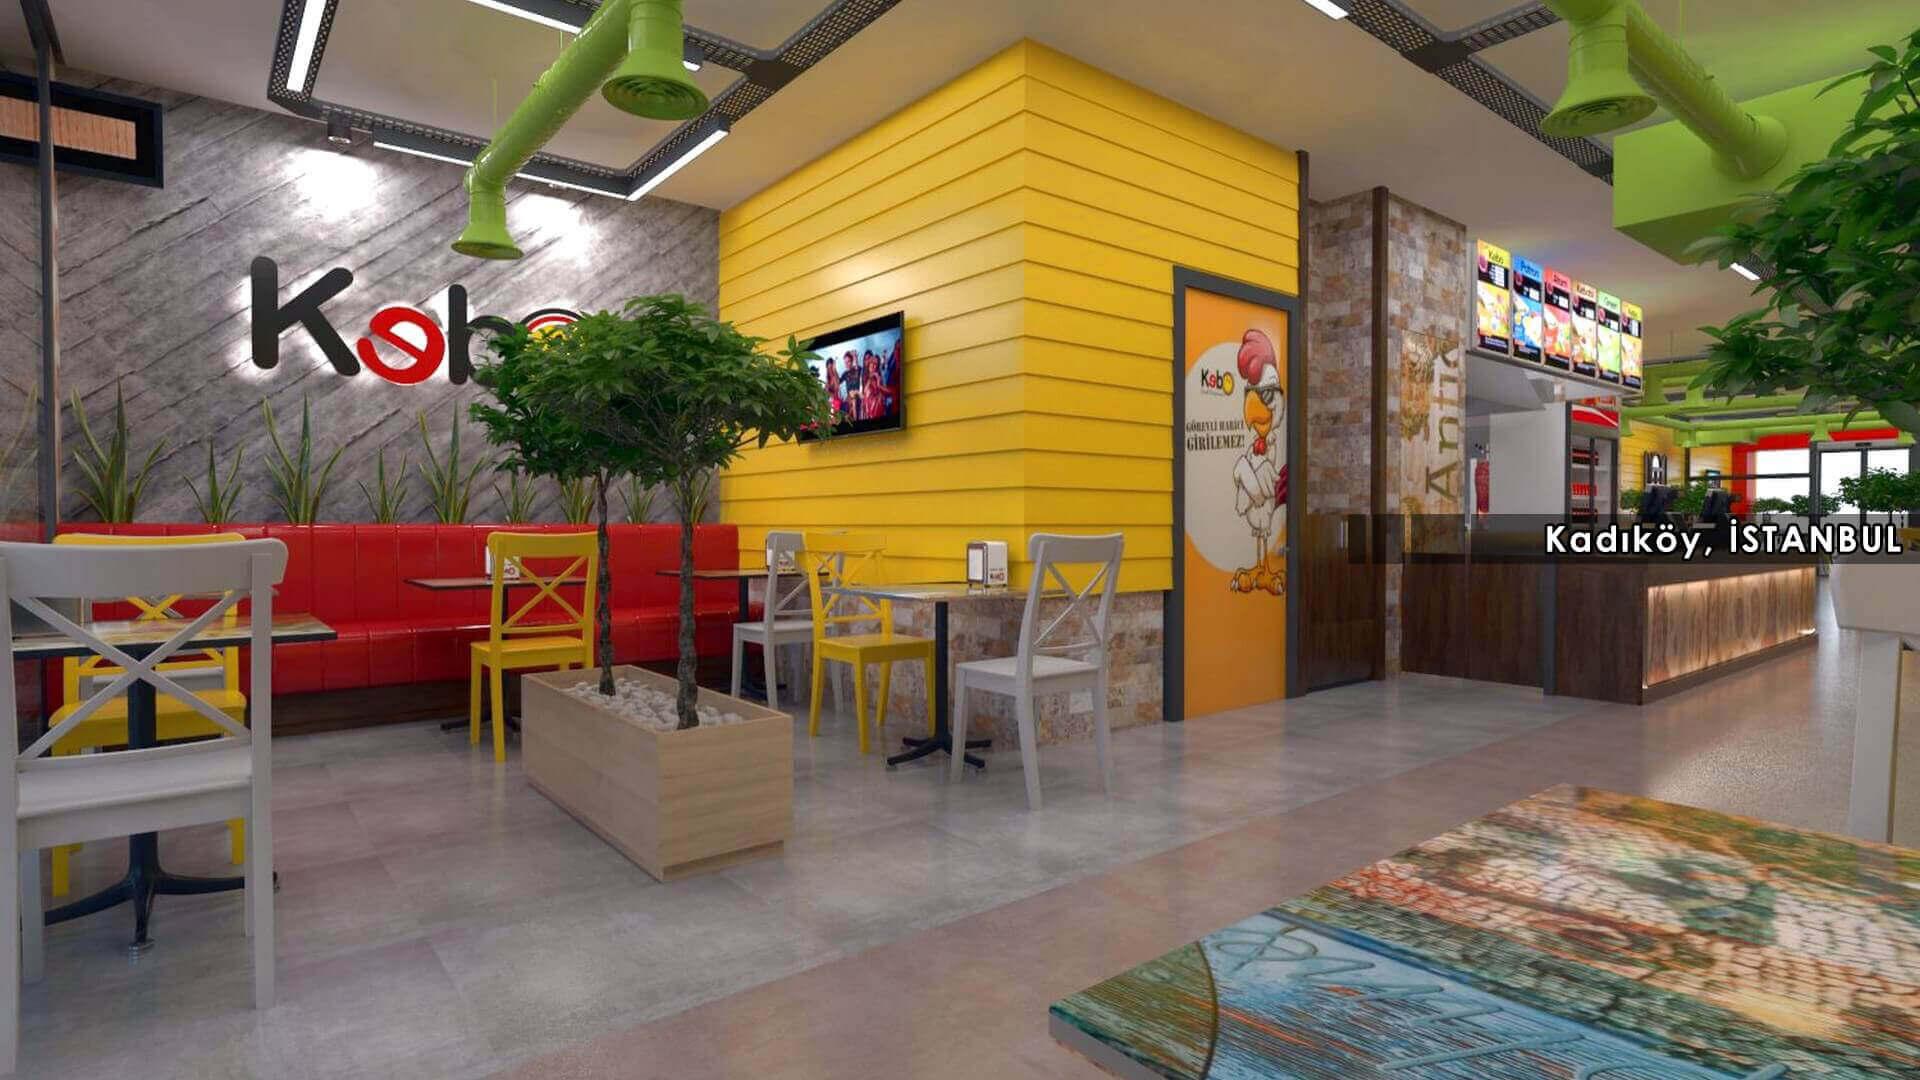 restorant iç mimar 2124 Kebo 2018 Restoranlar